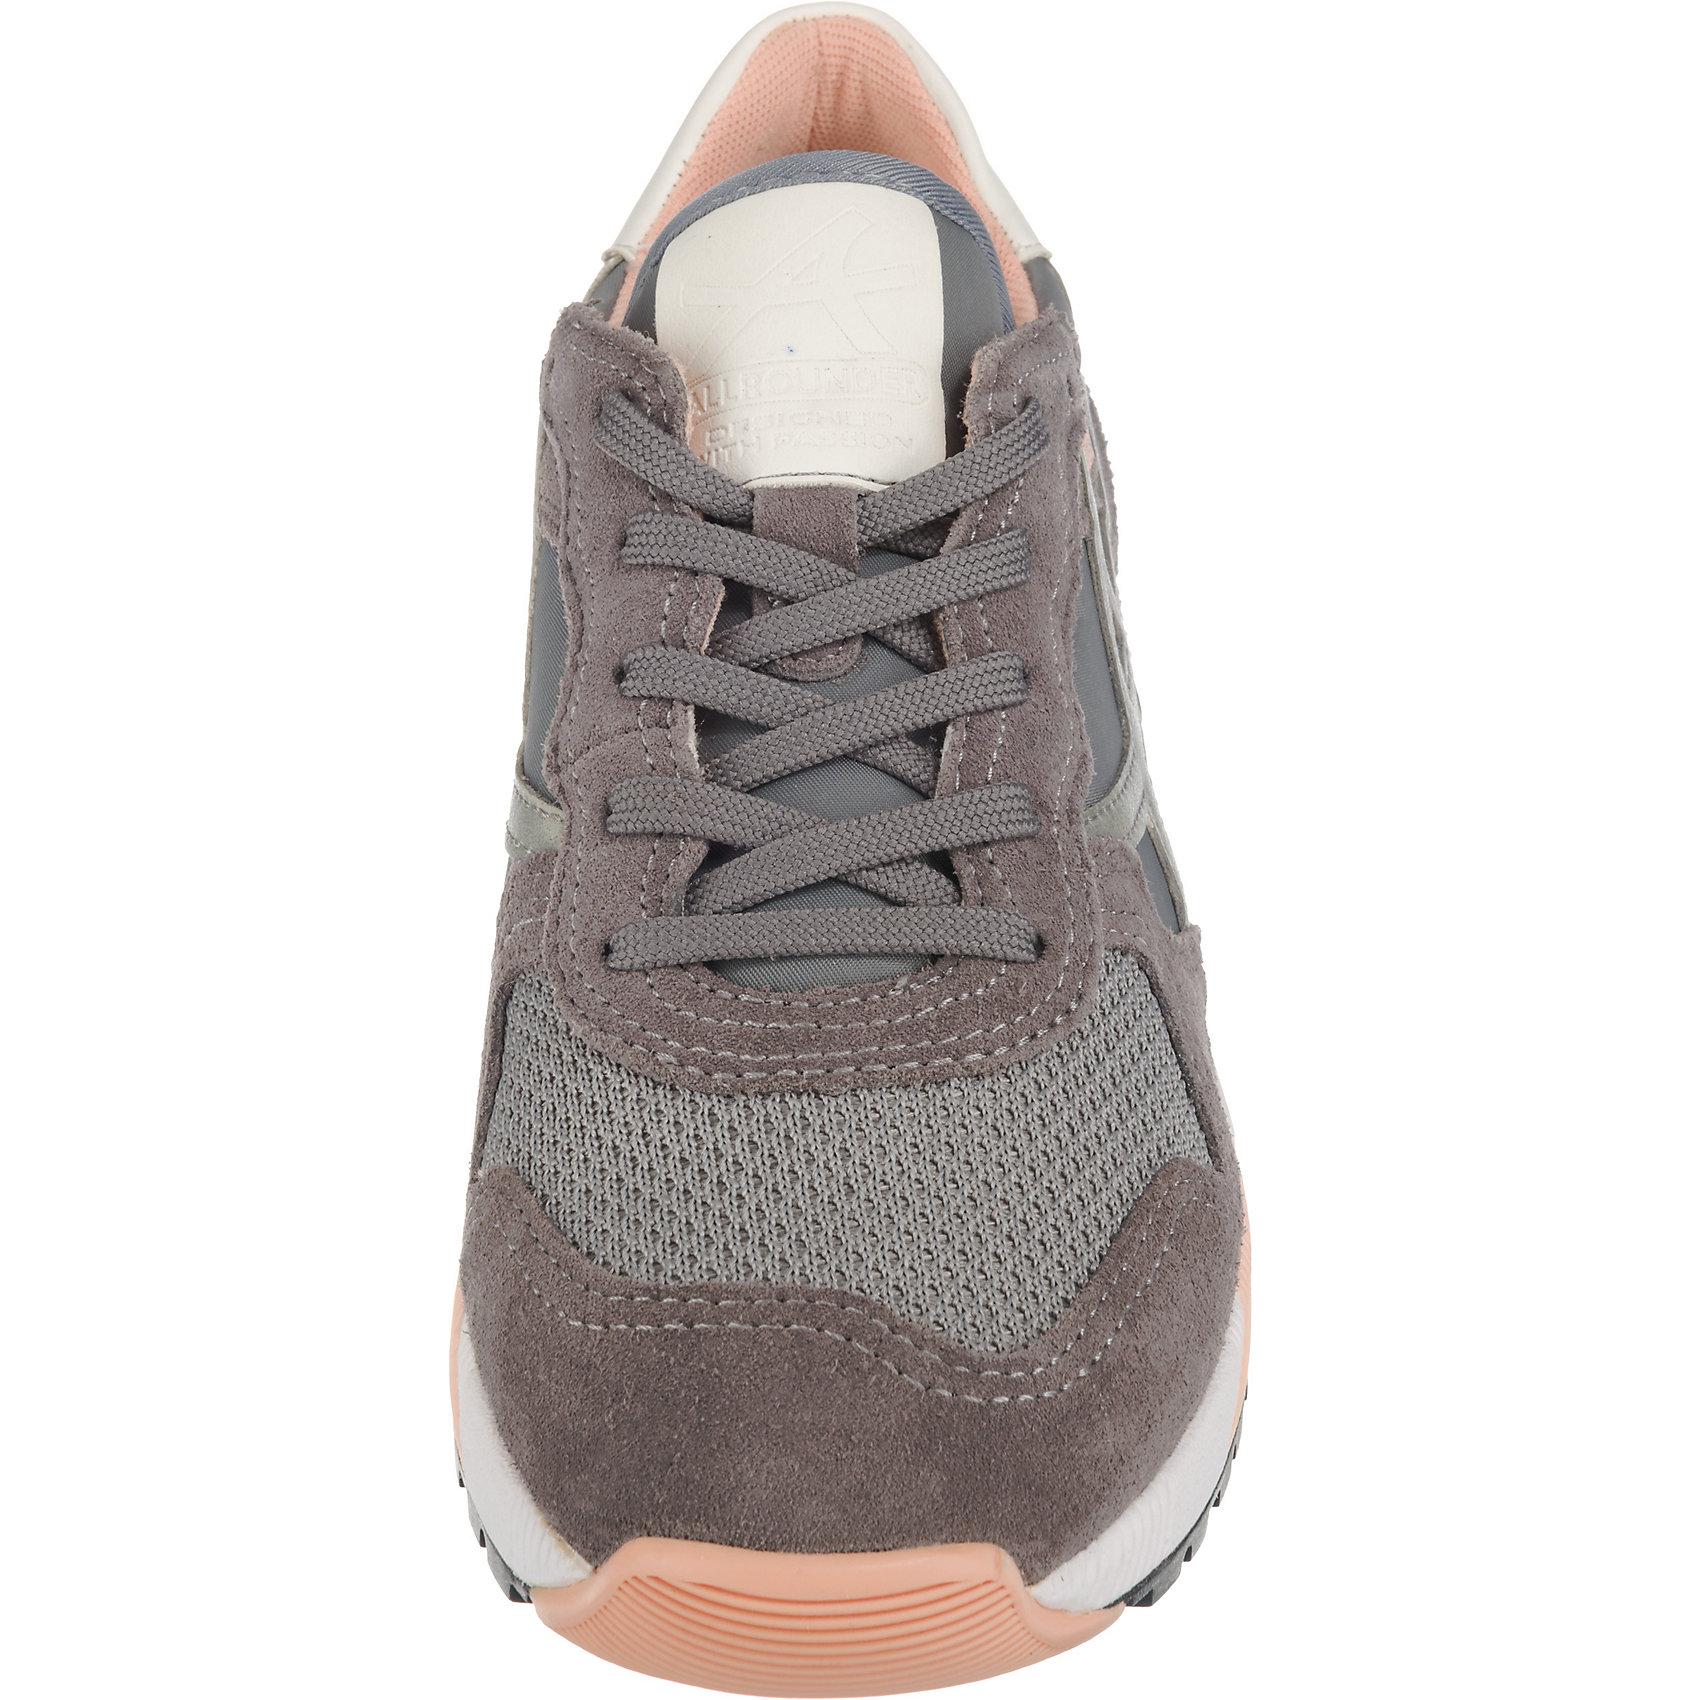 Mephisto VITESSE Sneakers Low Damen 1QVRwLa